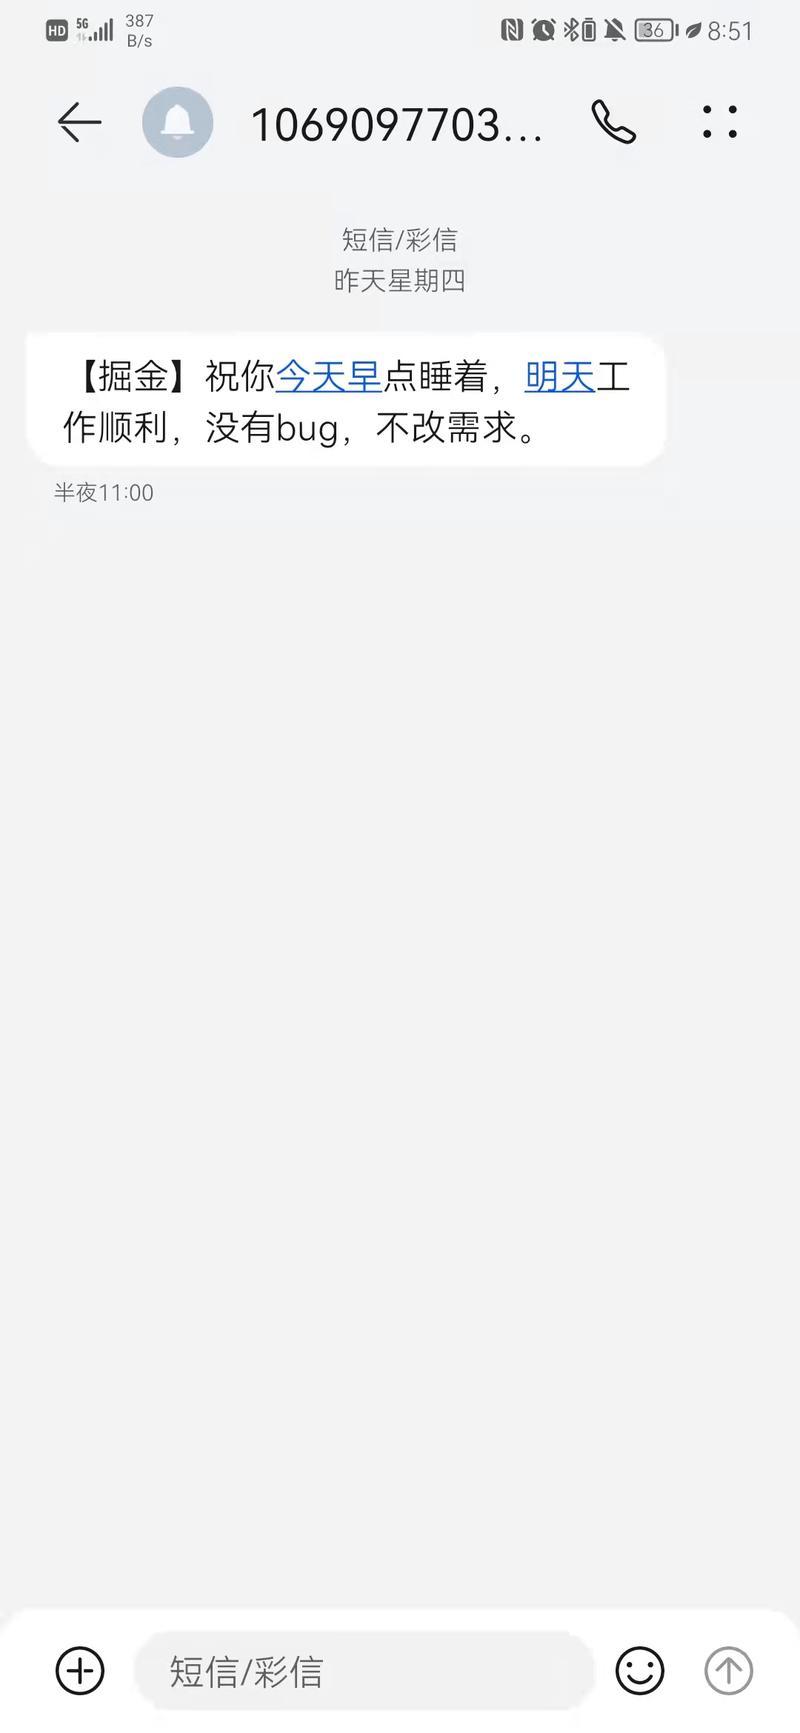 tangxd3于2021-10-22 08:52发布的图片